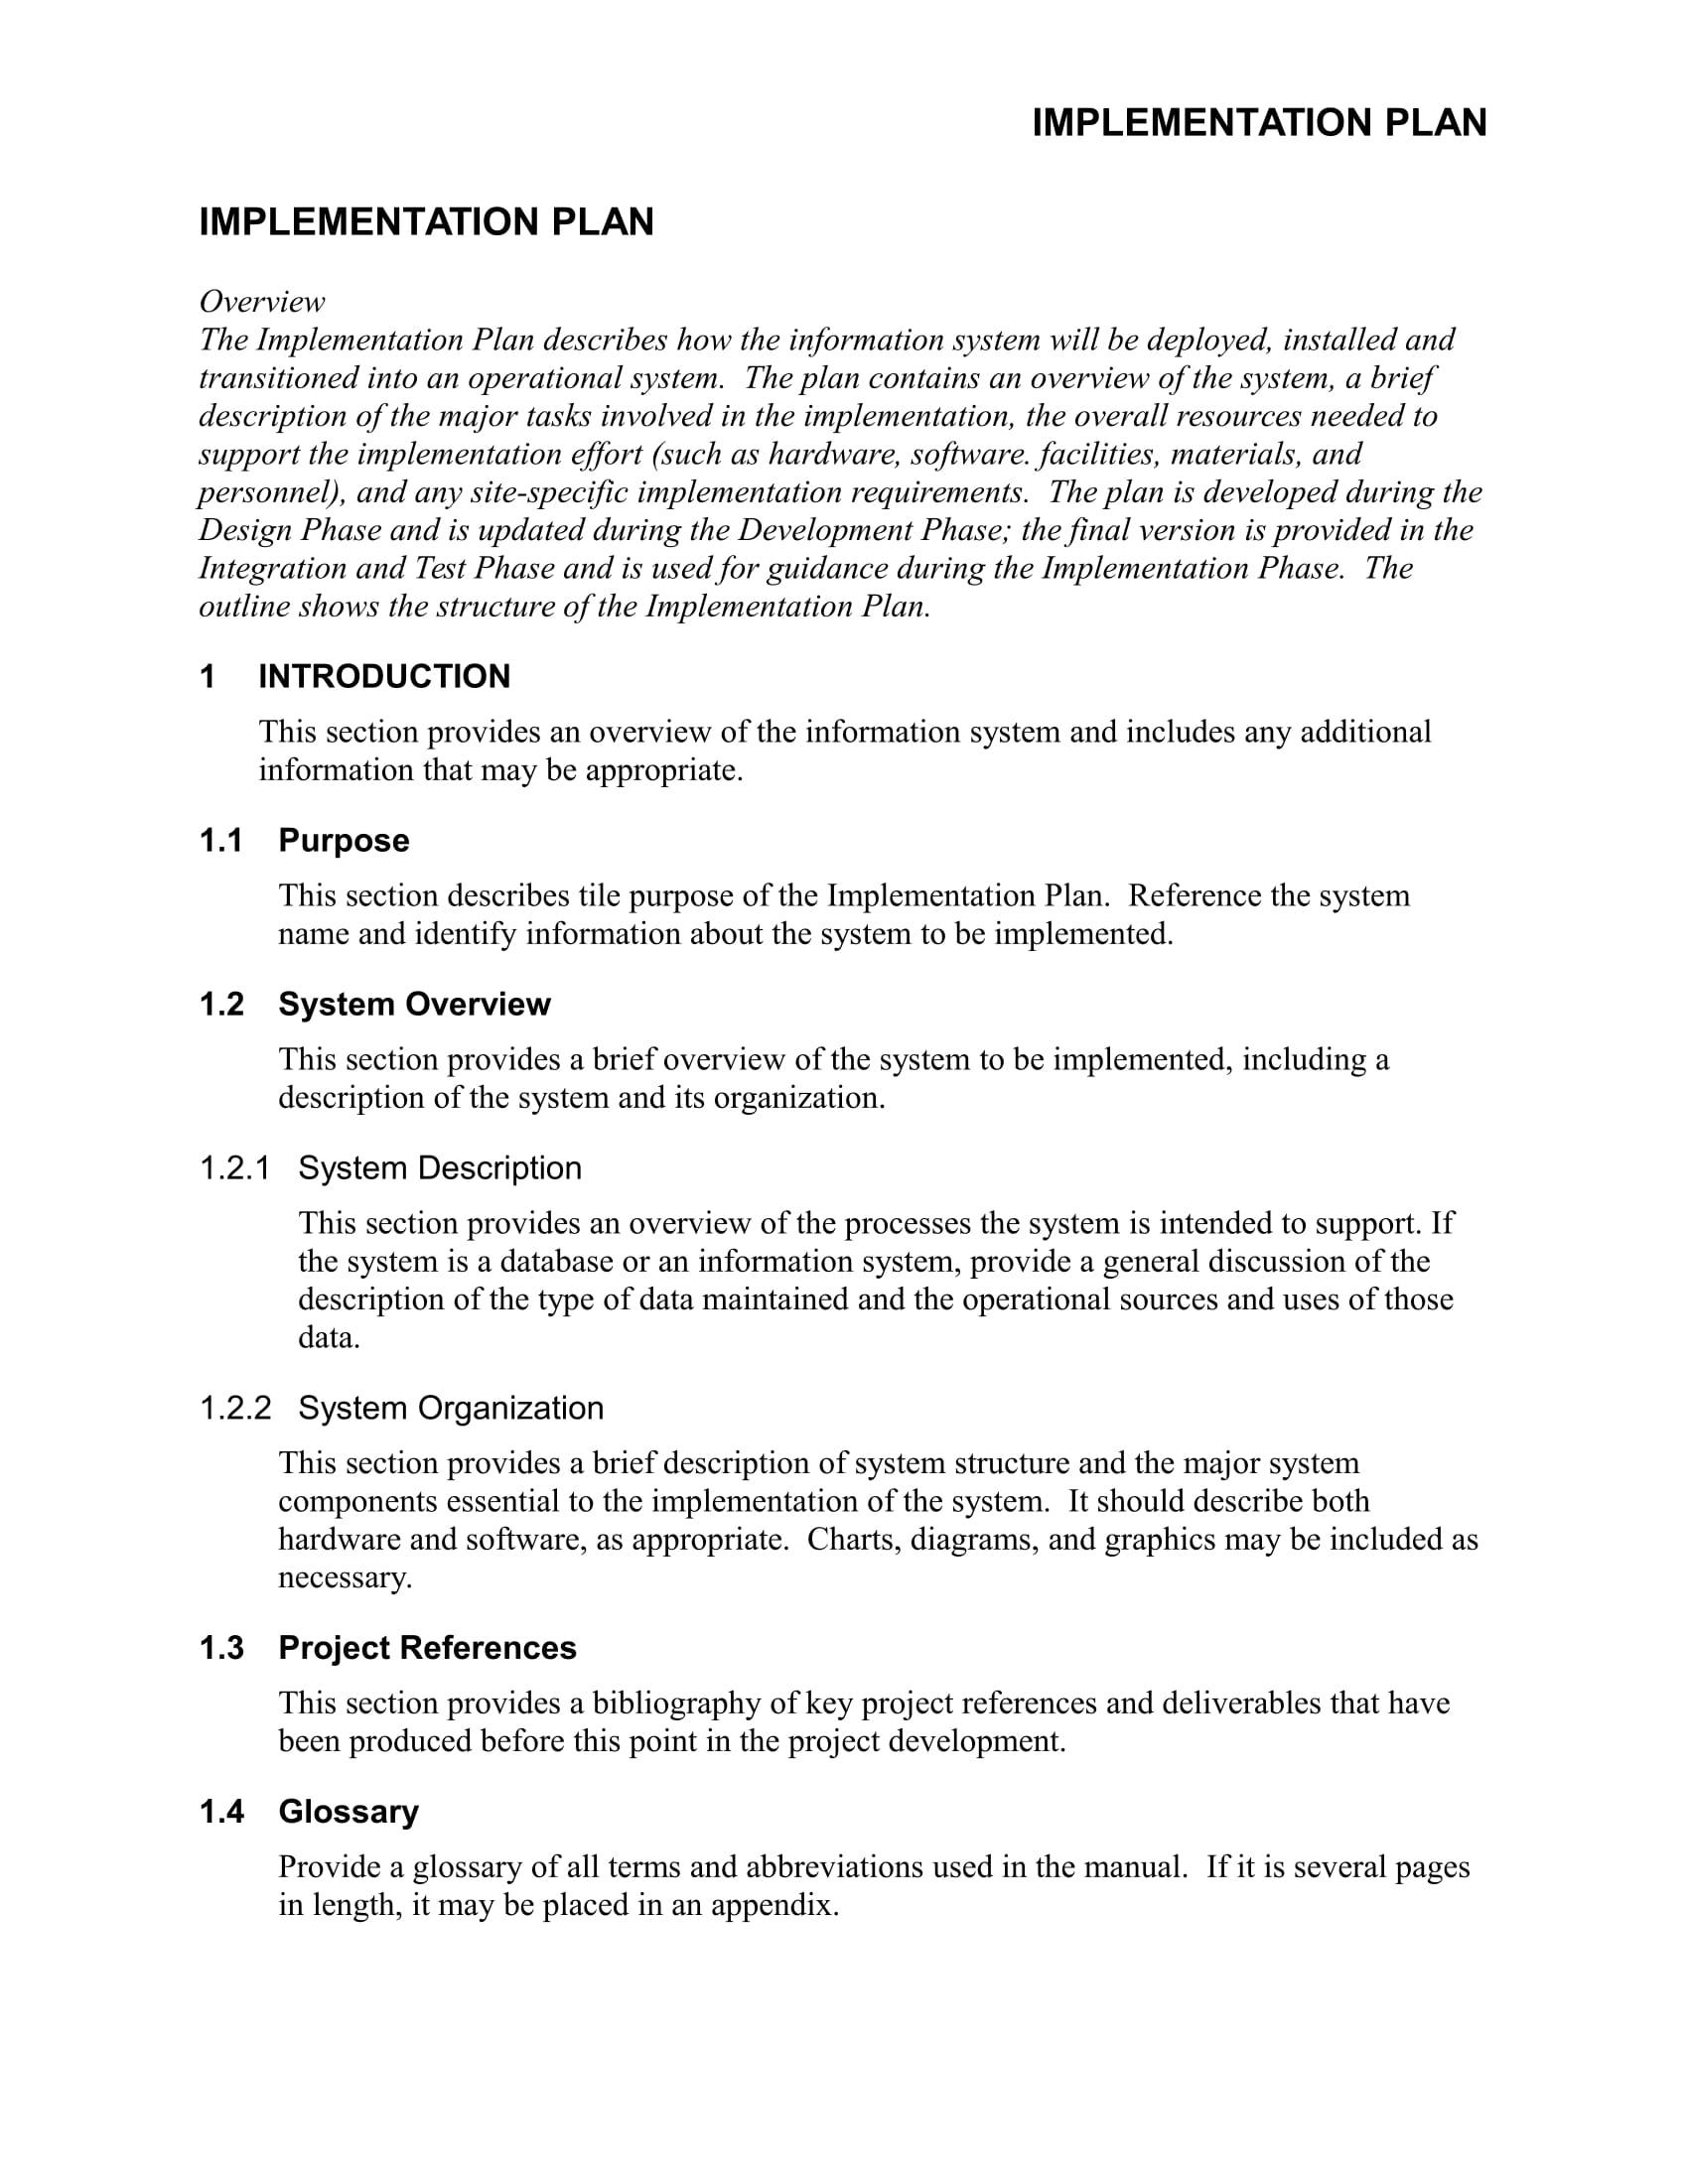 sample implementation plan template